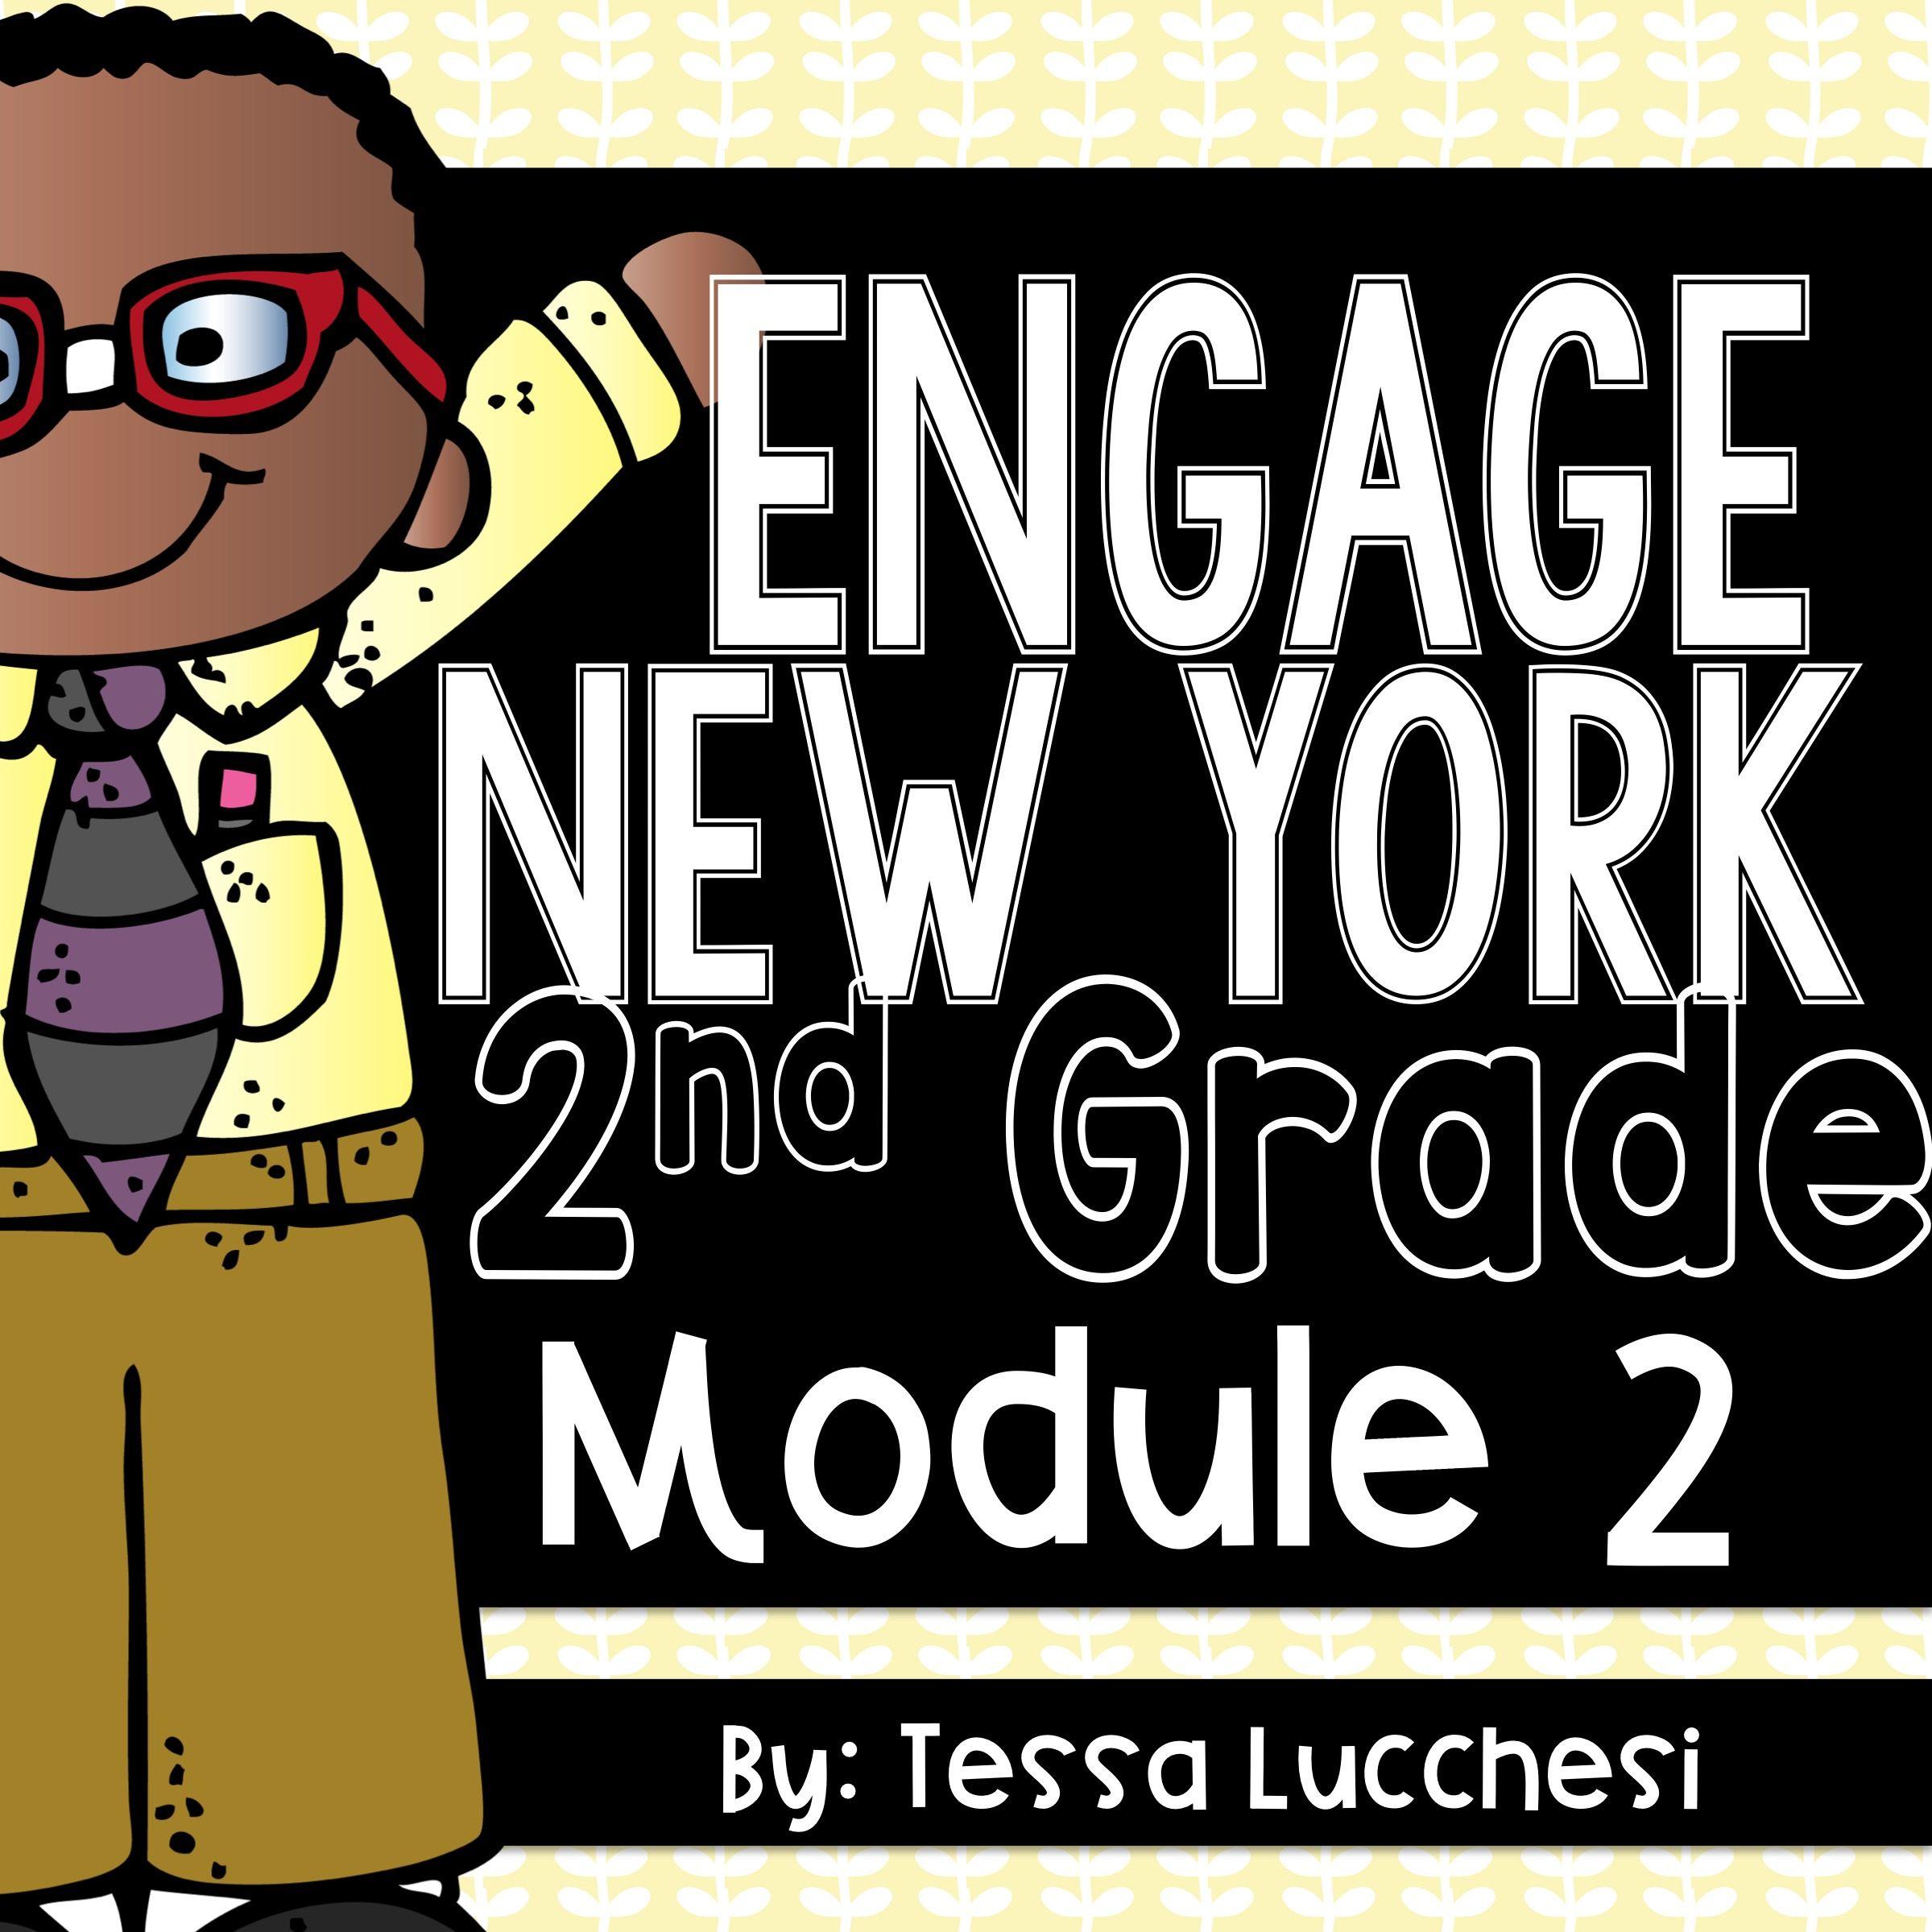 Eureka math centers2nd grade module 2 eureka math pinterest great to use to reinforce skills taught in module 2 of 2nd grade engage nyeureka math curriculum fandeluxe Images